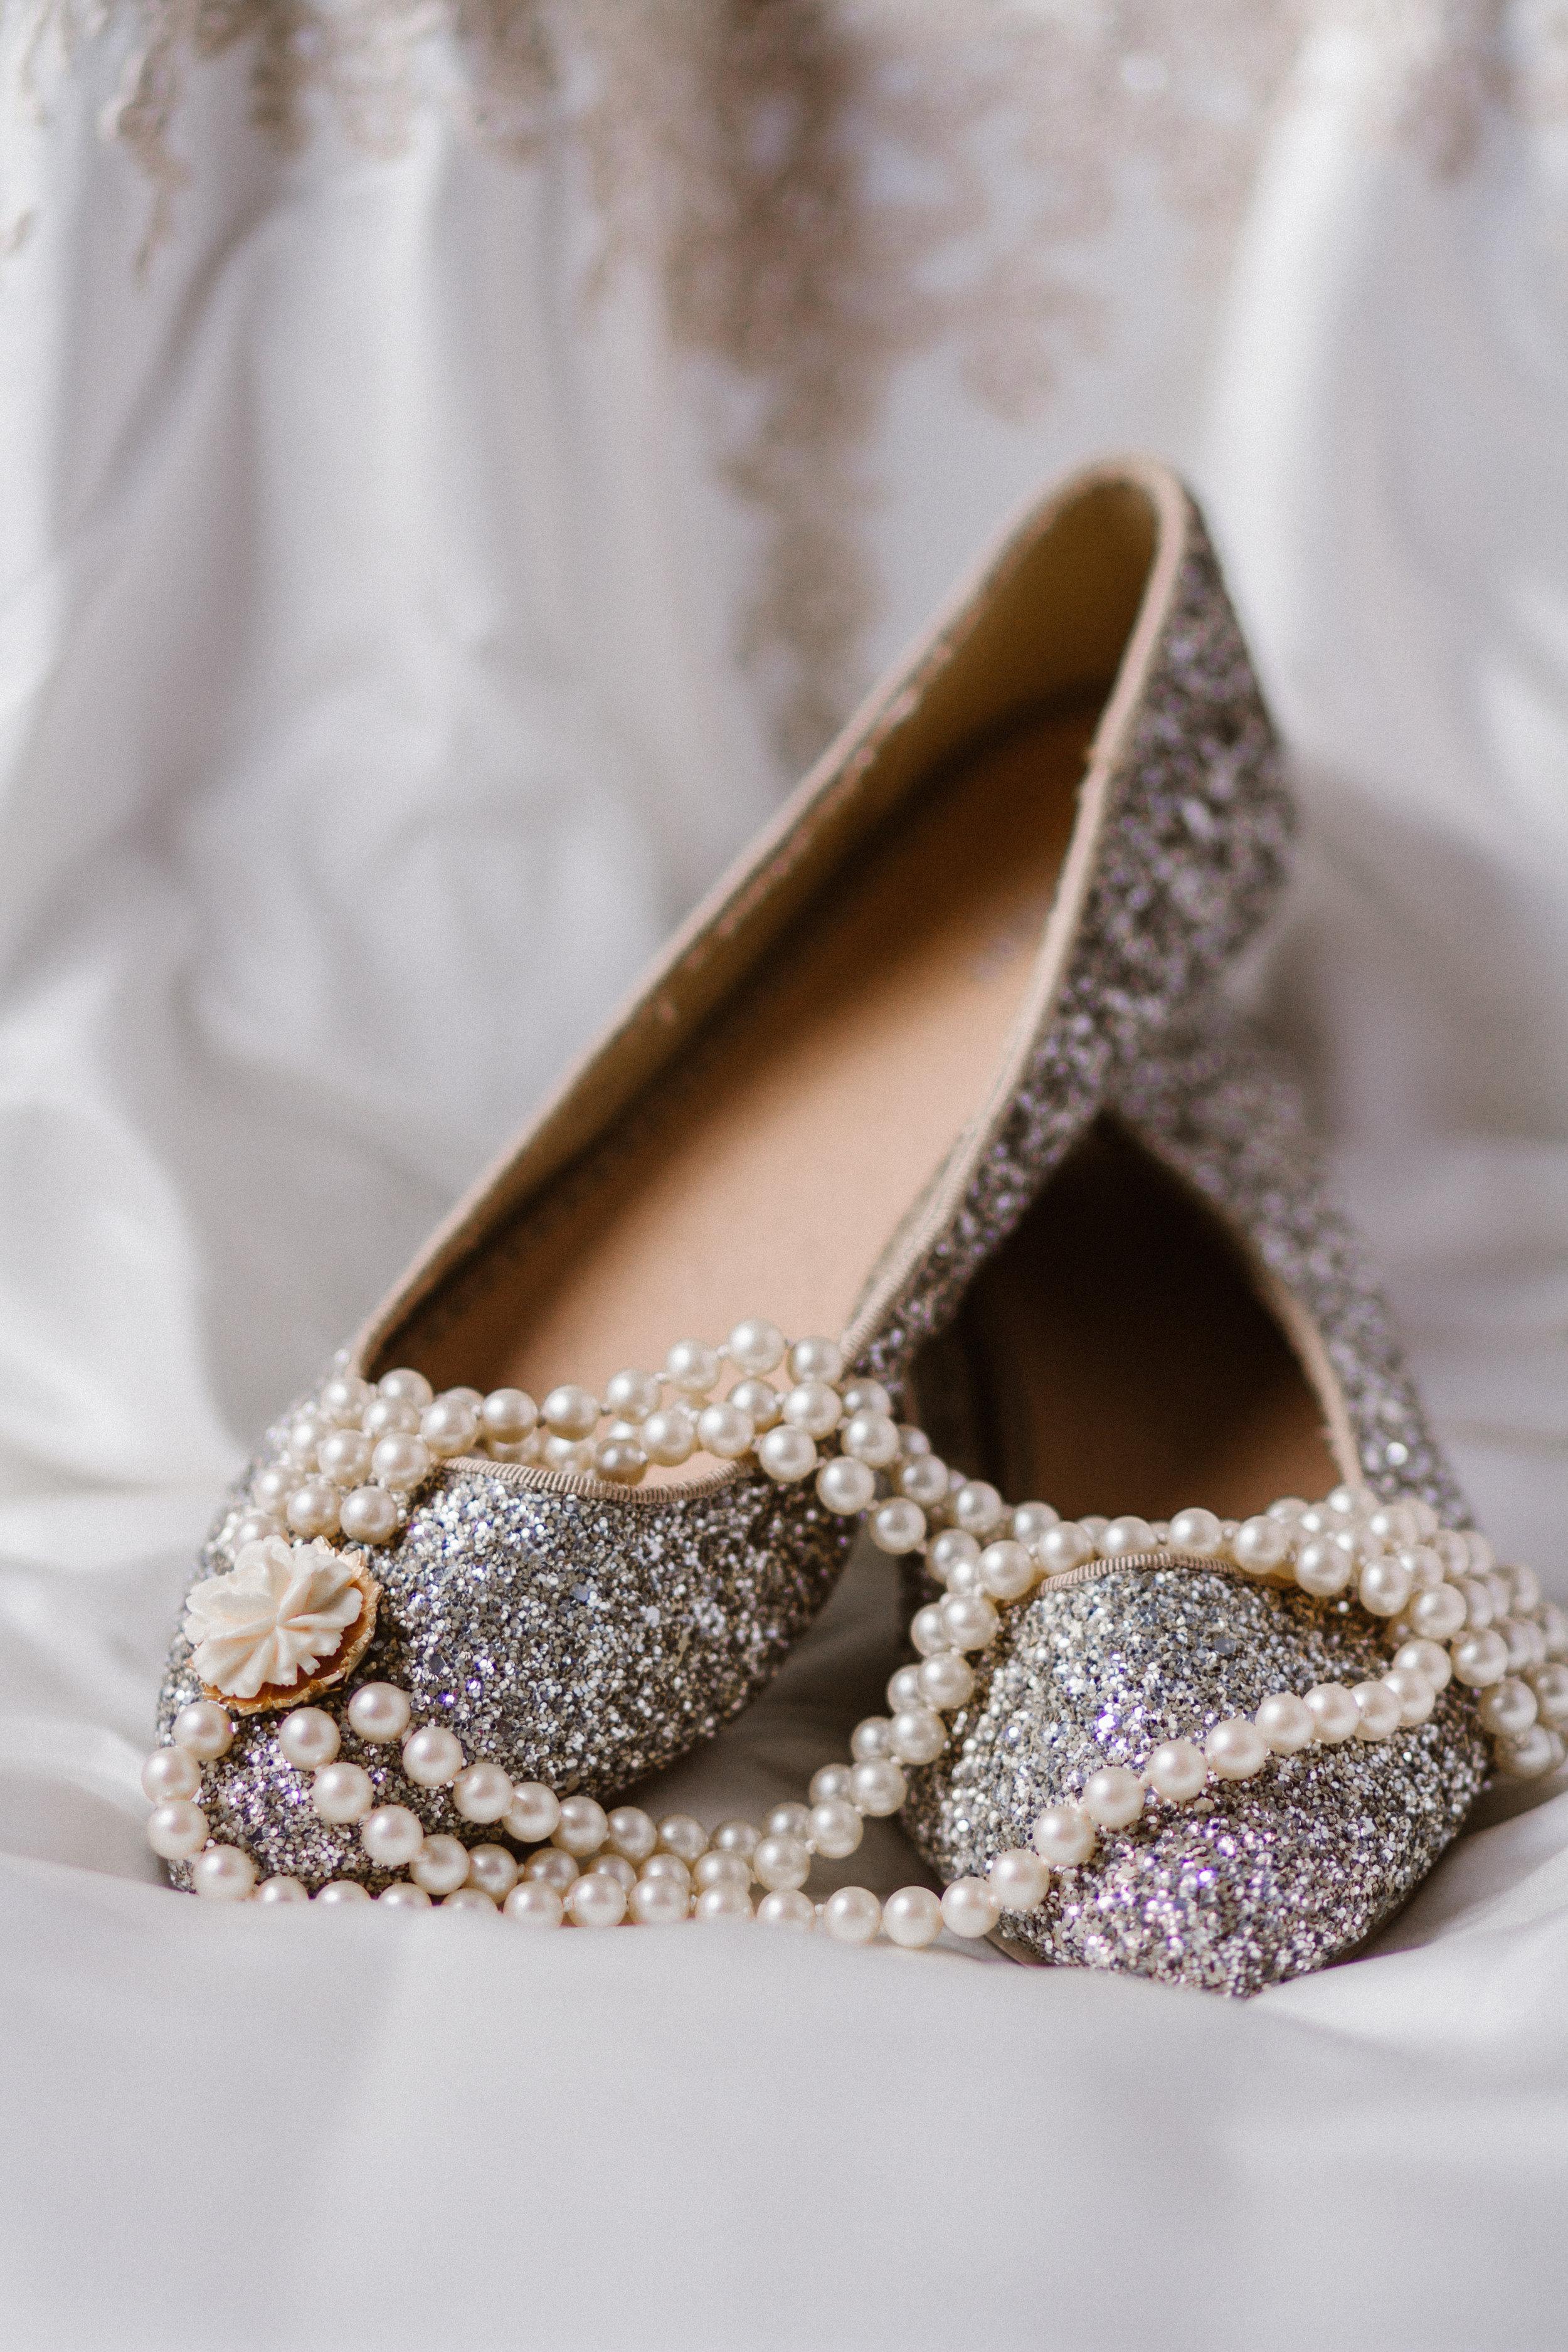 Wedding Bridal Accessory Shoe Jewelry Necklace Photographer Shannon Sorensen Photography